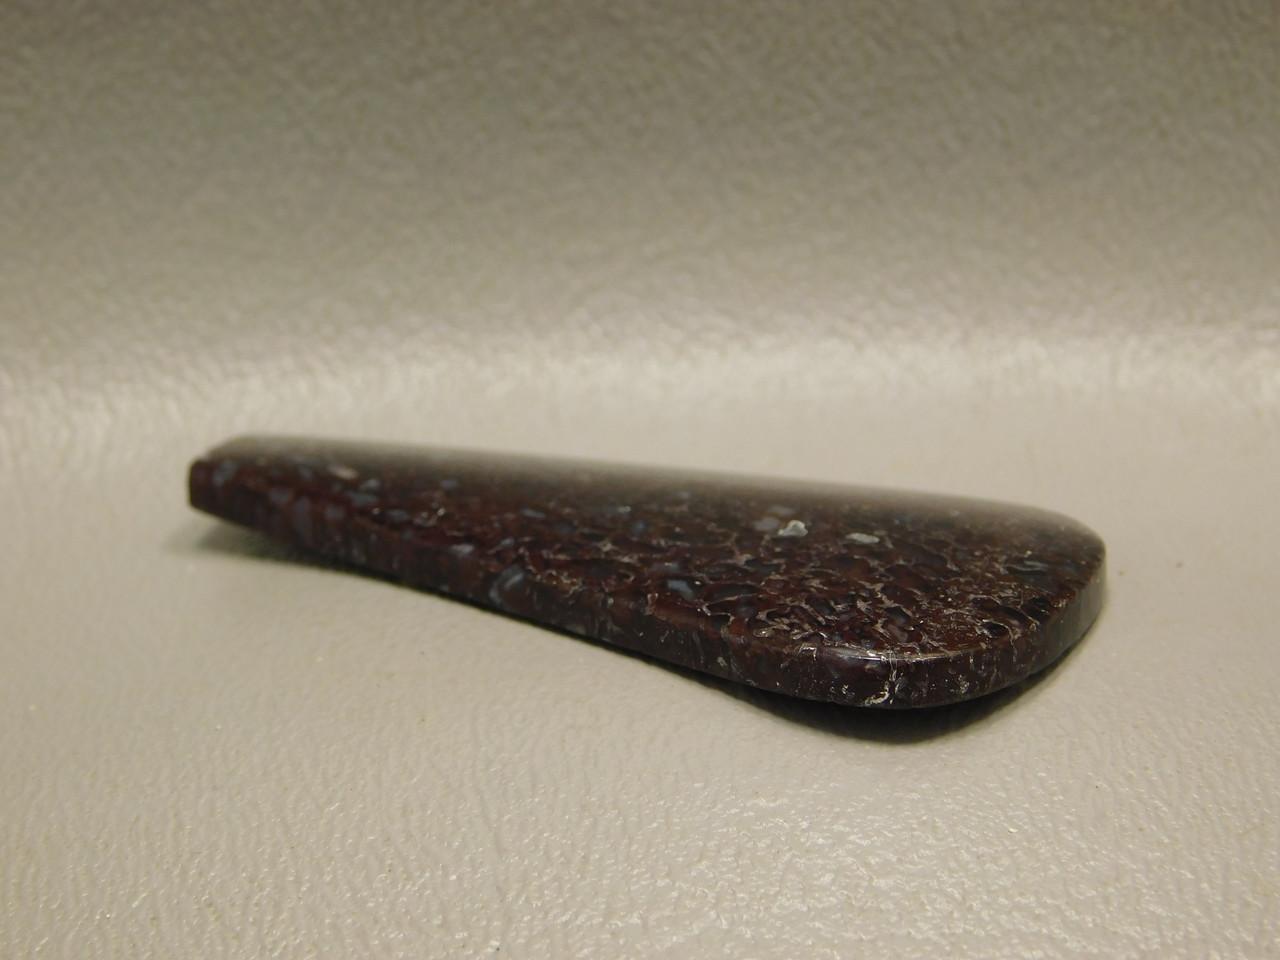 Translucent Large Drop Shaped Dinosaur Bone Fossil Cabochon #10